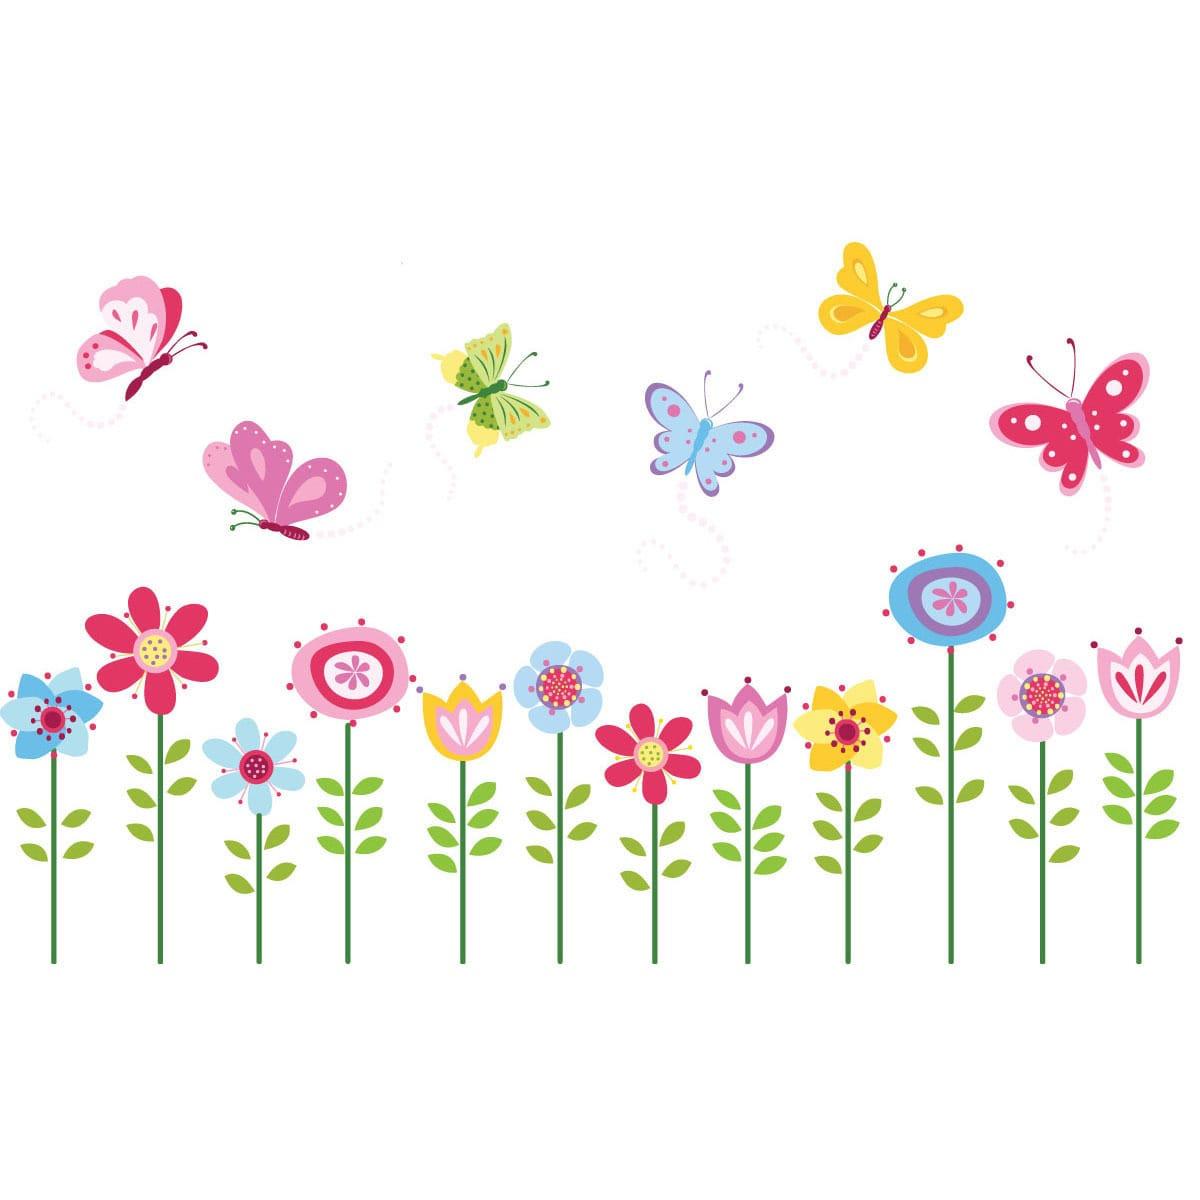 Cherry creek inc Bright Butterfly Garden Peel & Stick Kids Room/ Nursery Wall Decal for Boys & Girls